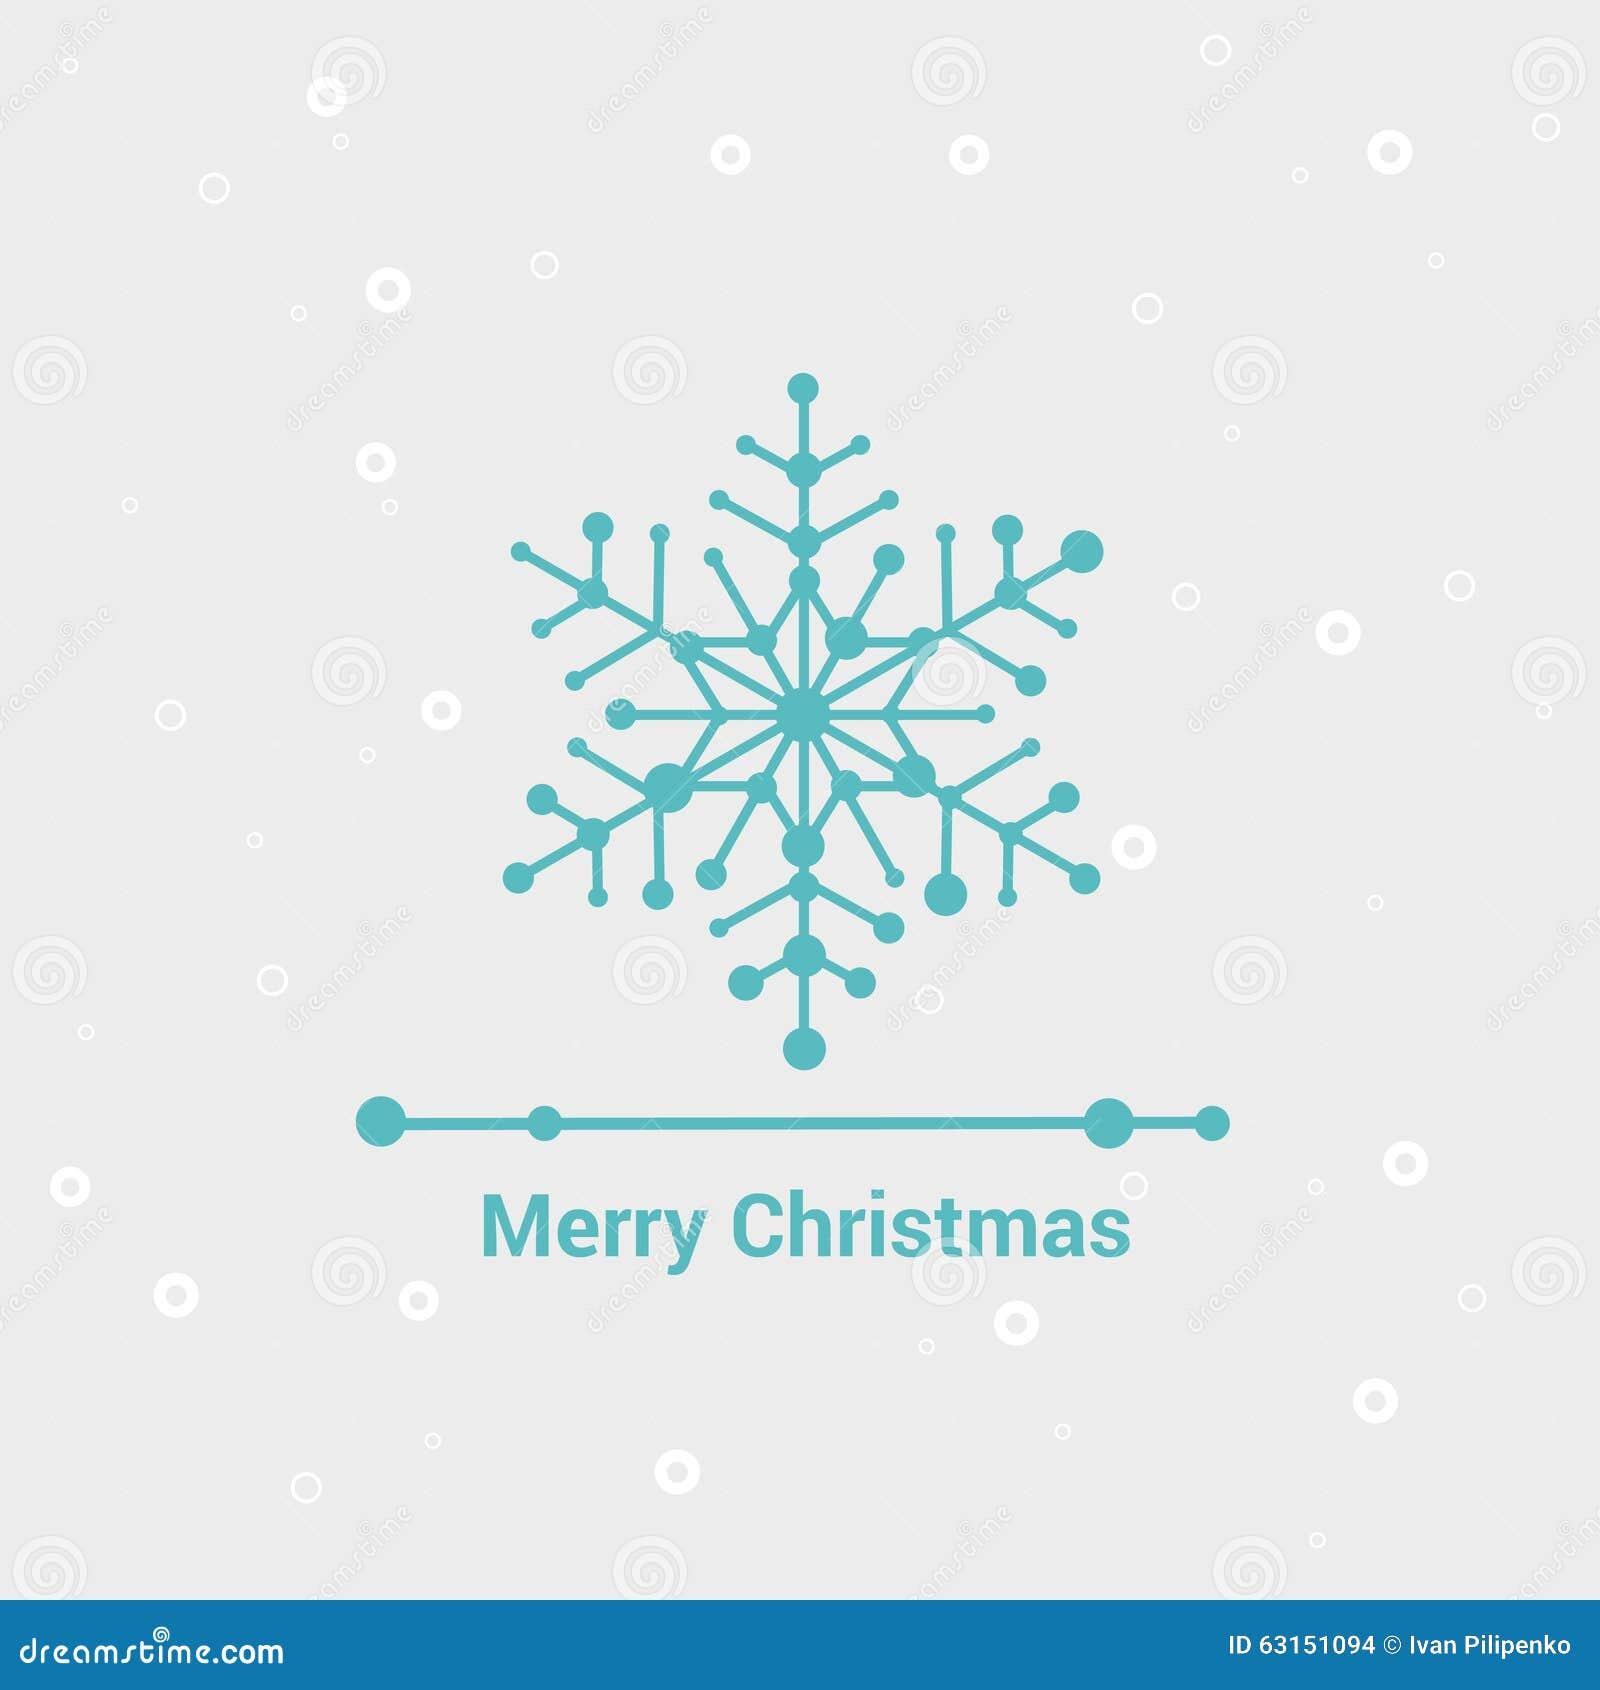 line minimalist style greeting card vector illustration